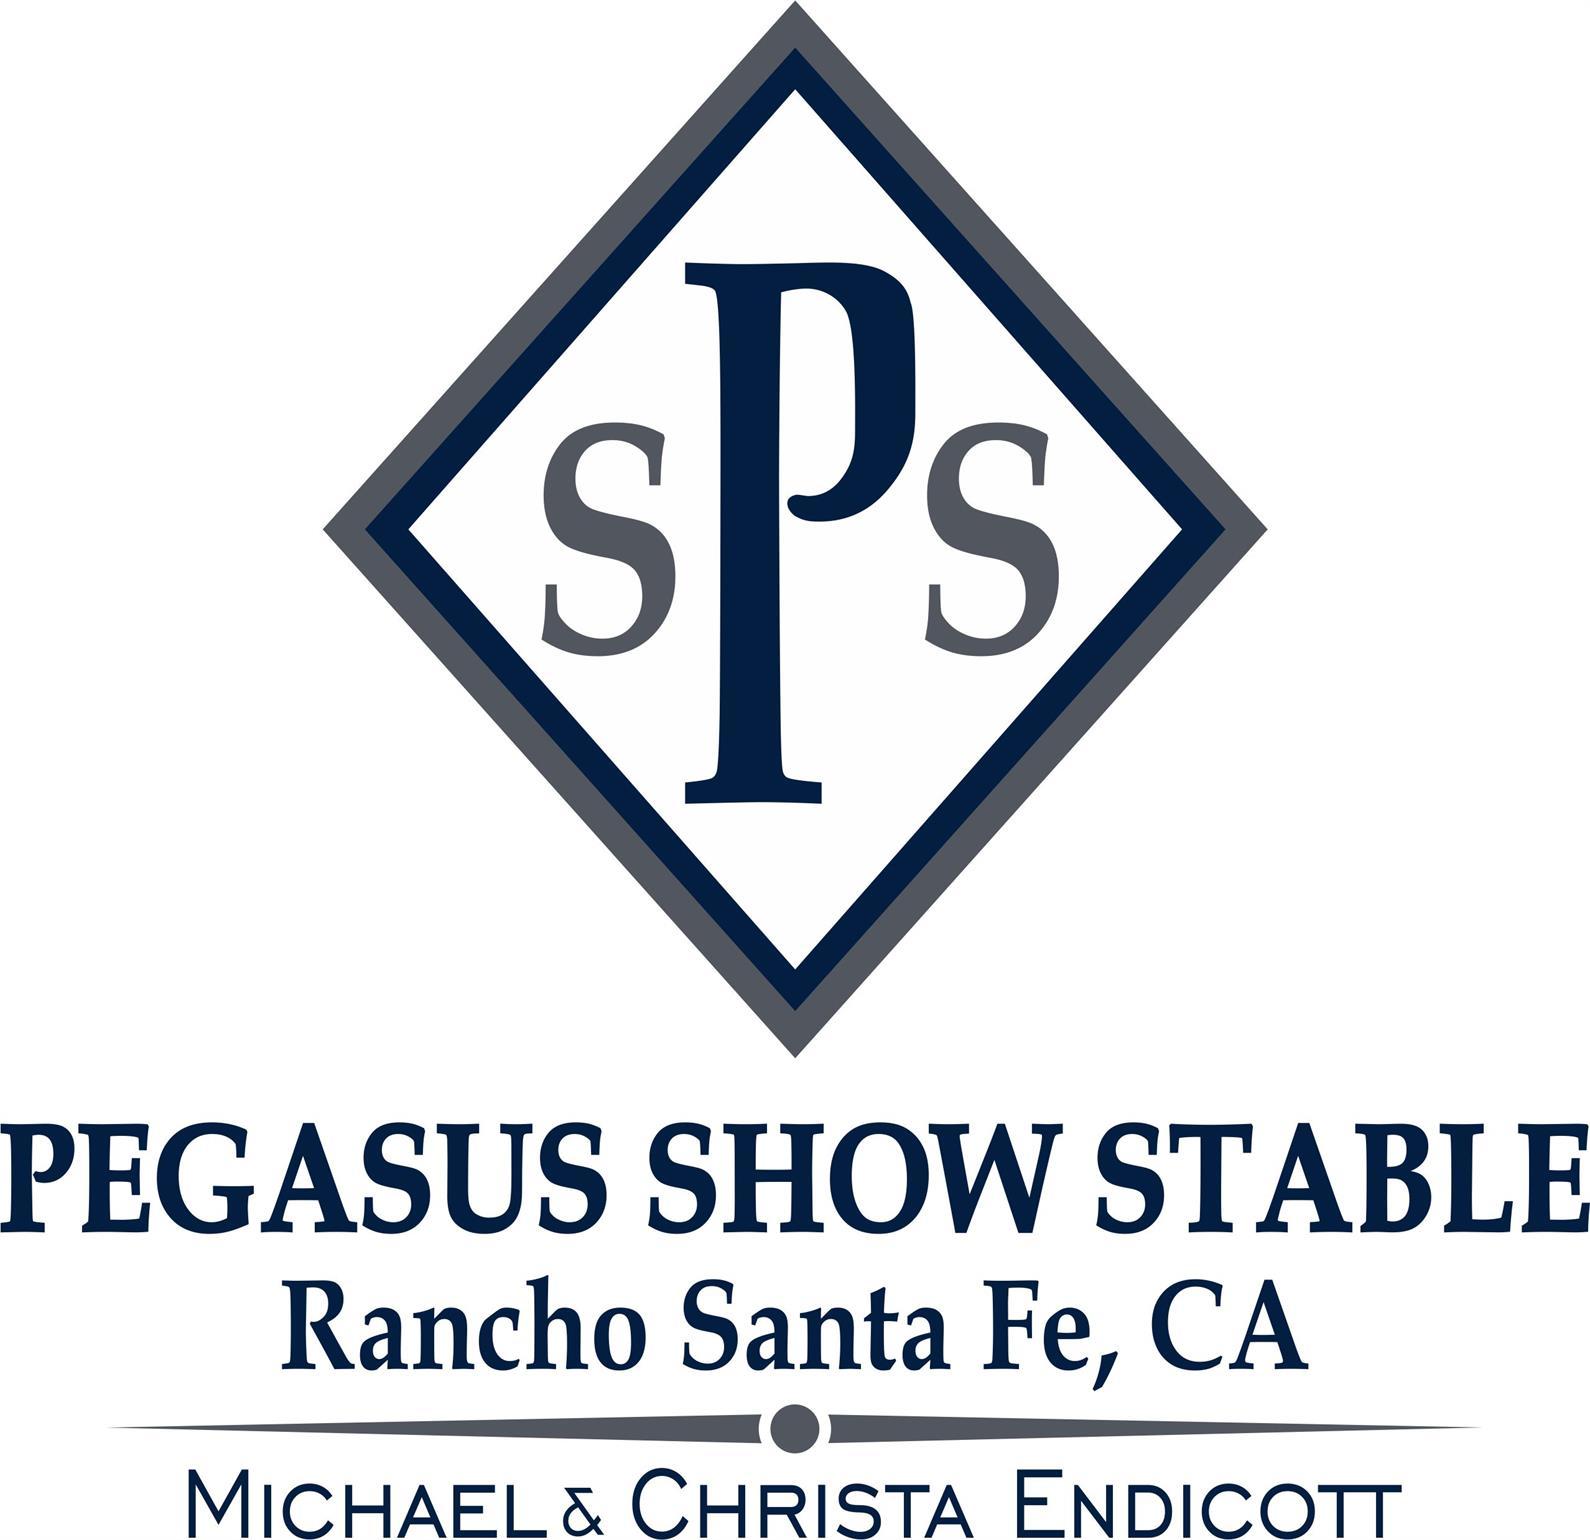 Pegasus Show Stable